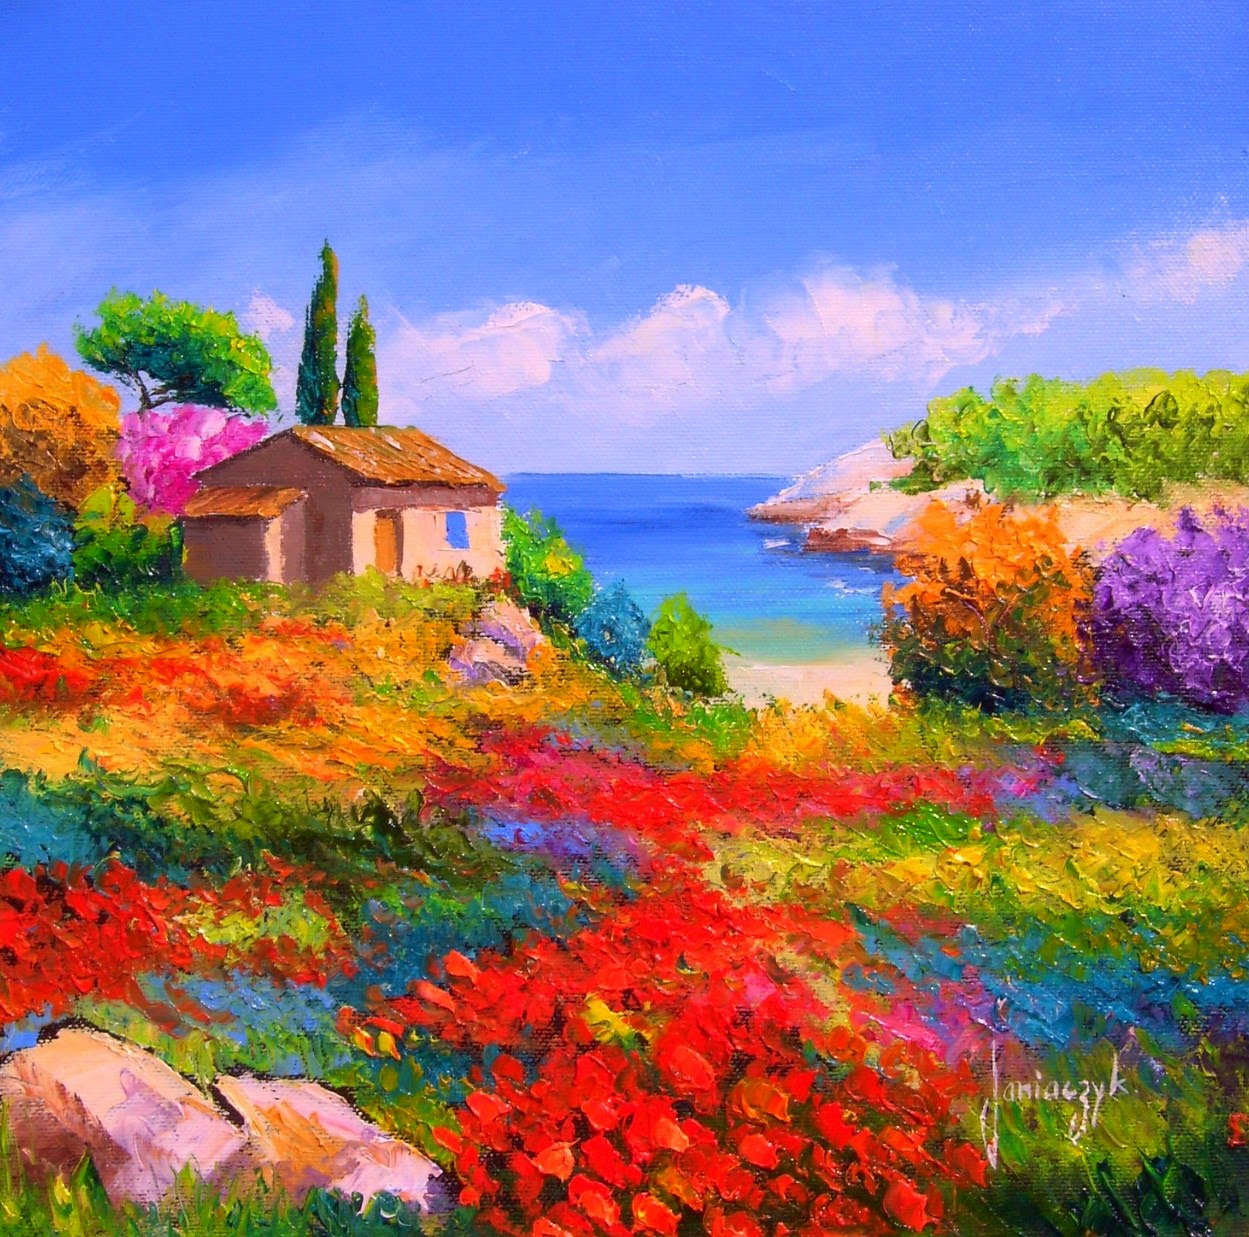 Cuadros modernos pinturas y dibujos coloridos paisajes - Paisajes de casas ...